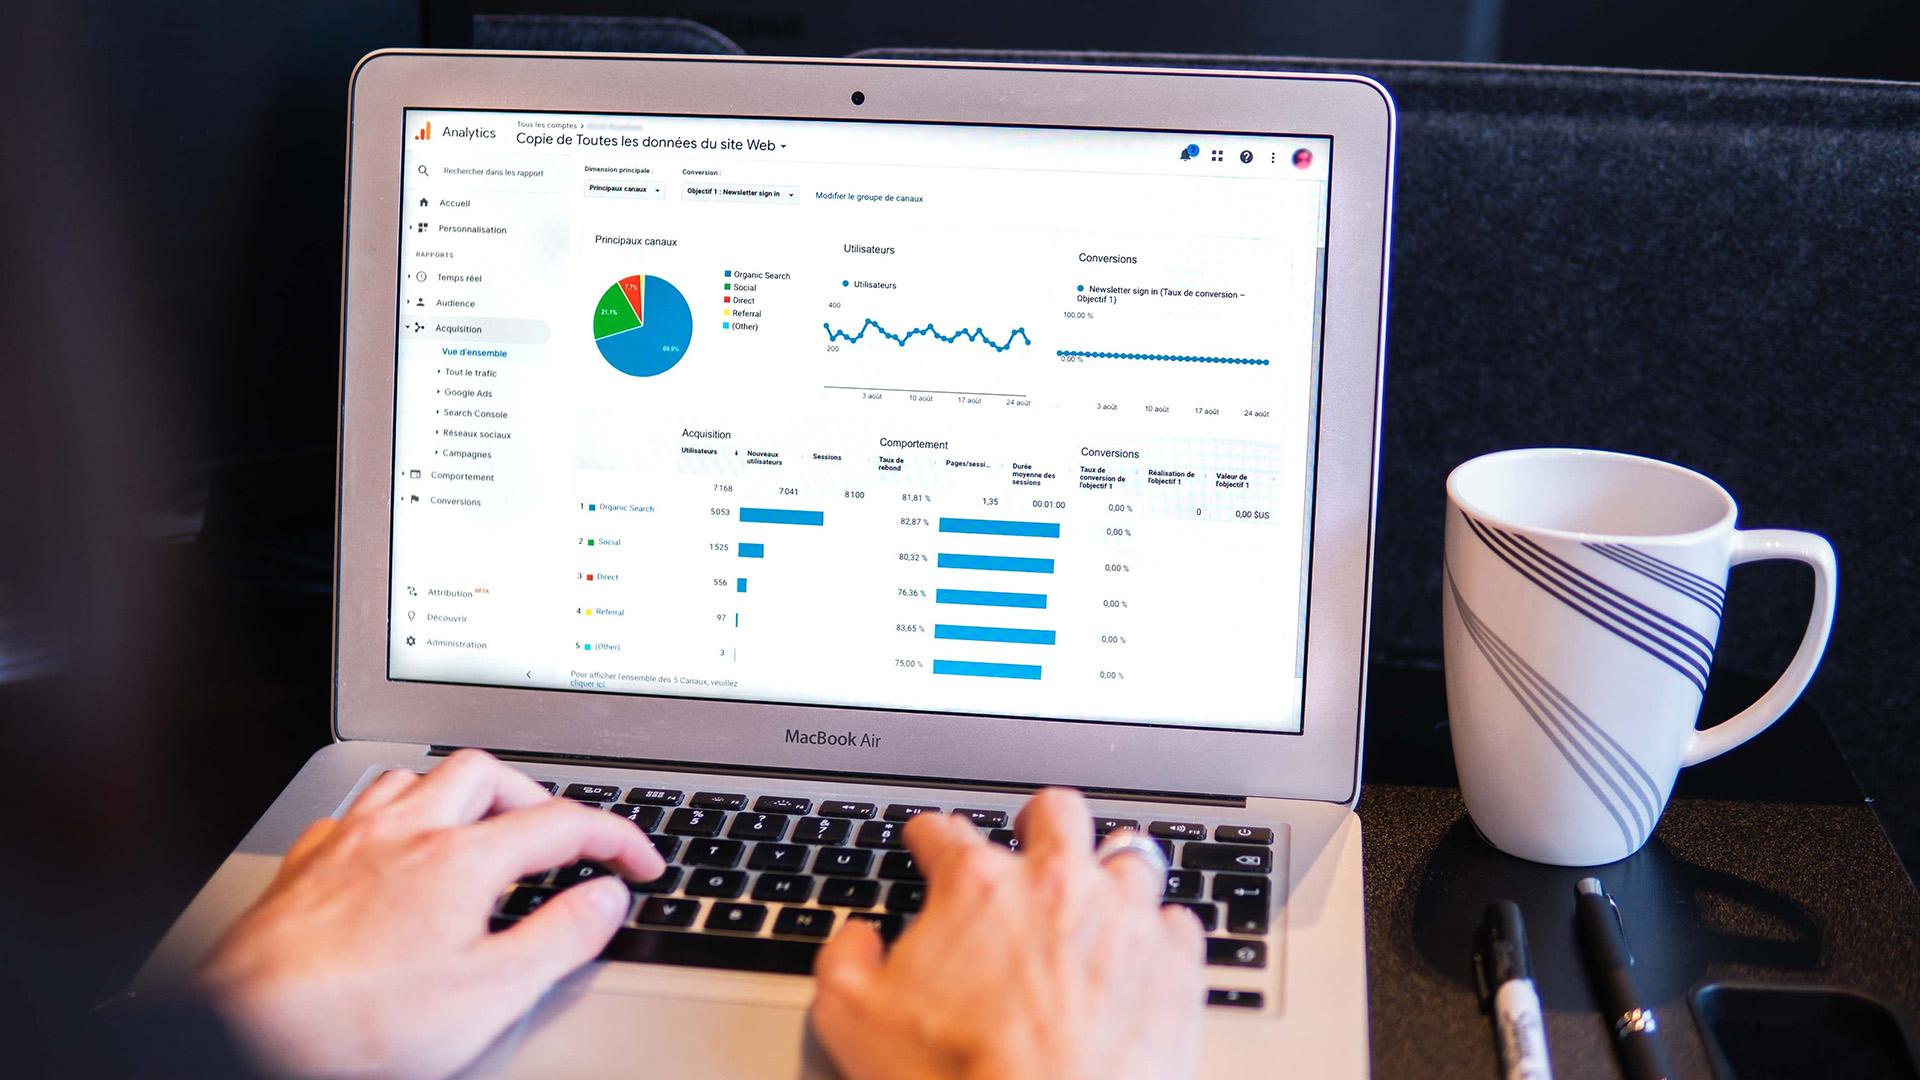 Performance analytics